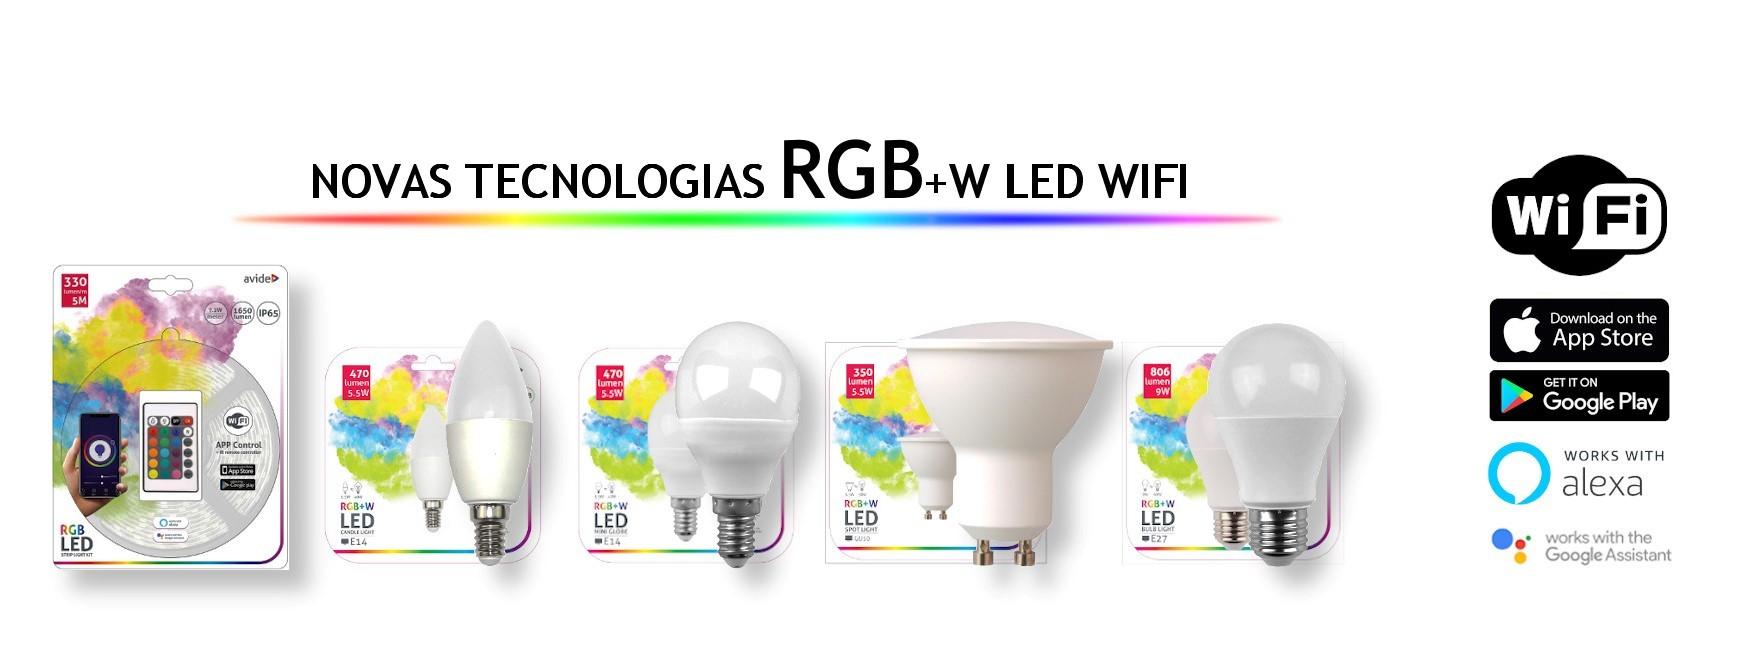 Especial RGB Wifi - Avide